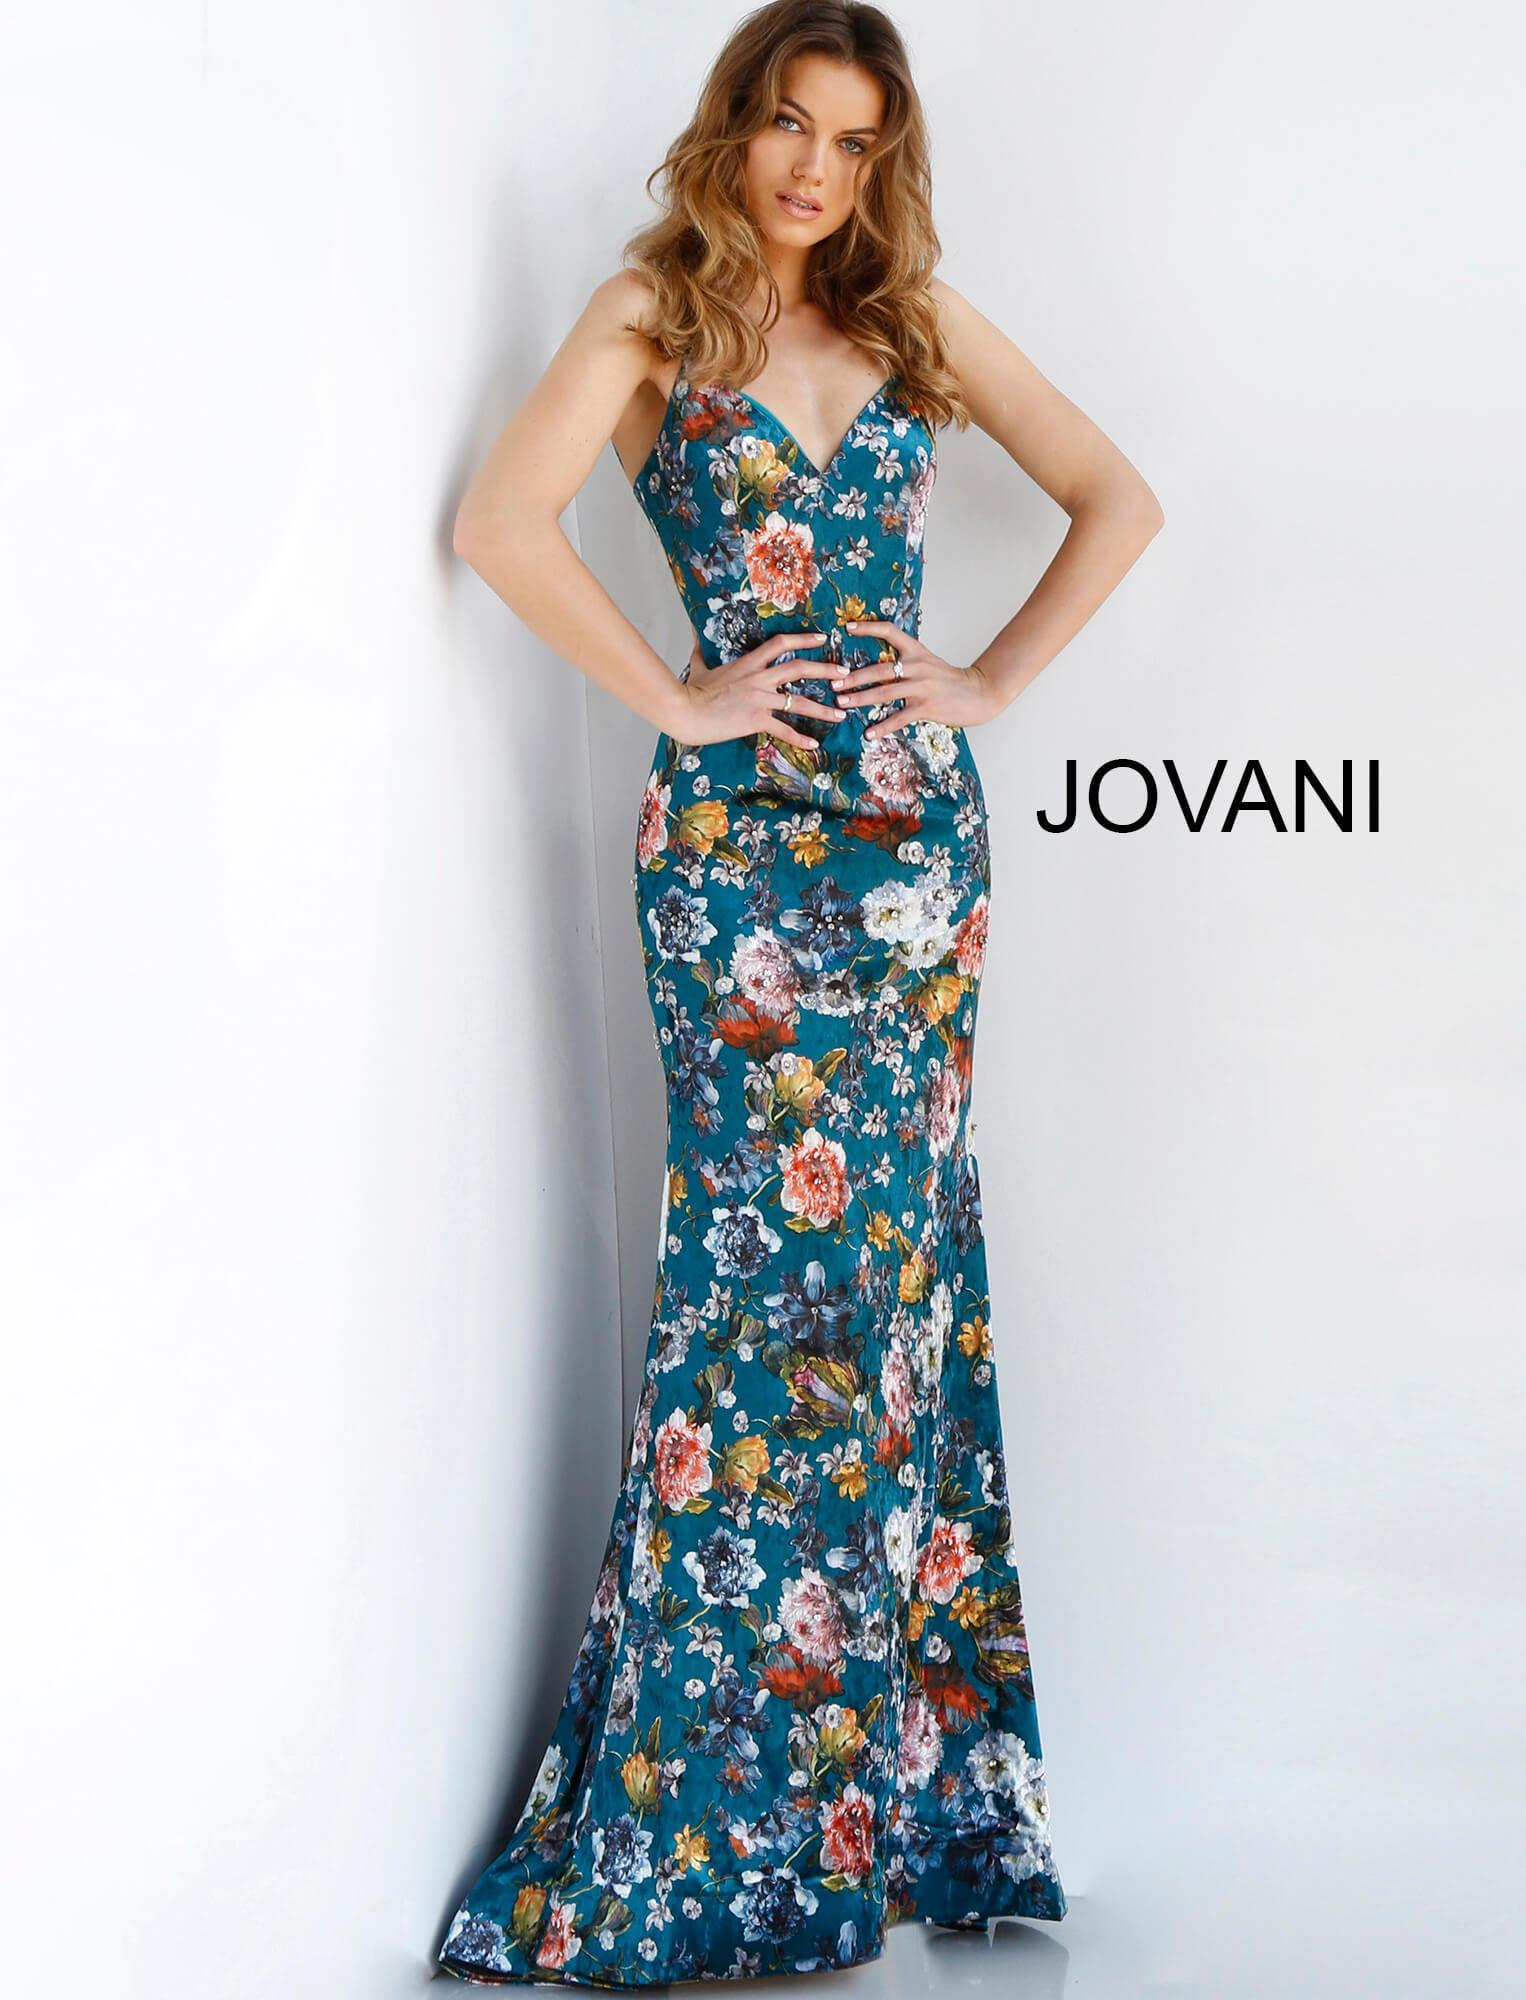 decd0d1de1776 Jovani 63576 Floral Print Plunging V-neck Trumpet Dress in Blue - Lyst